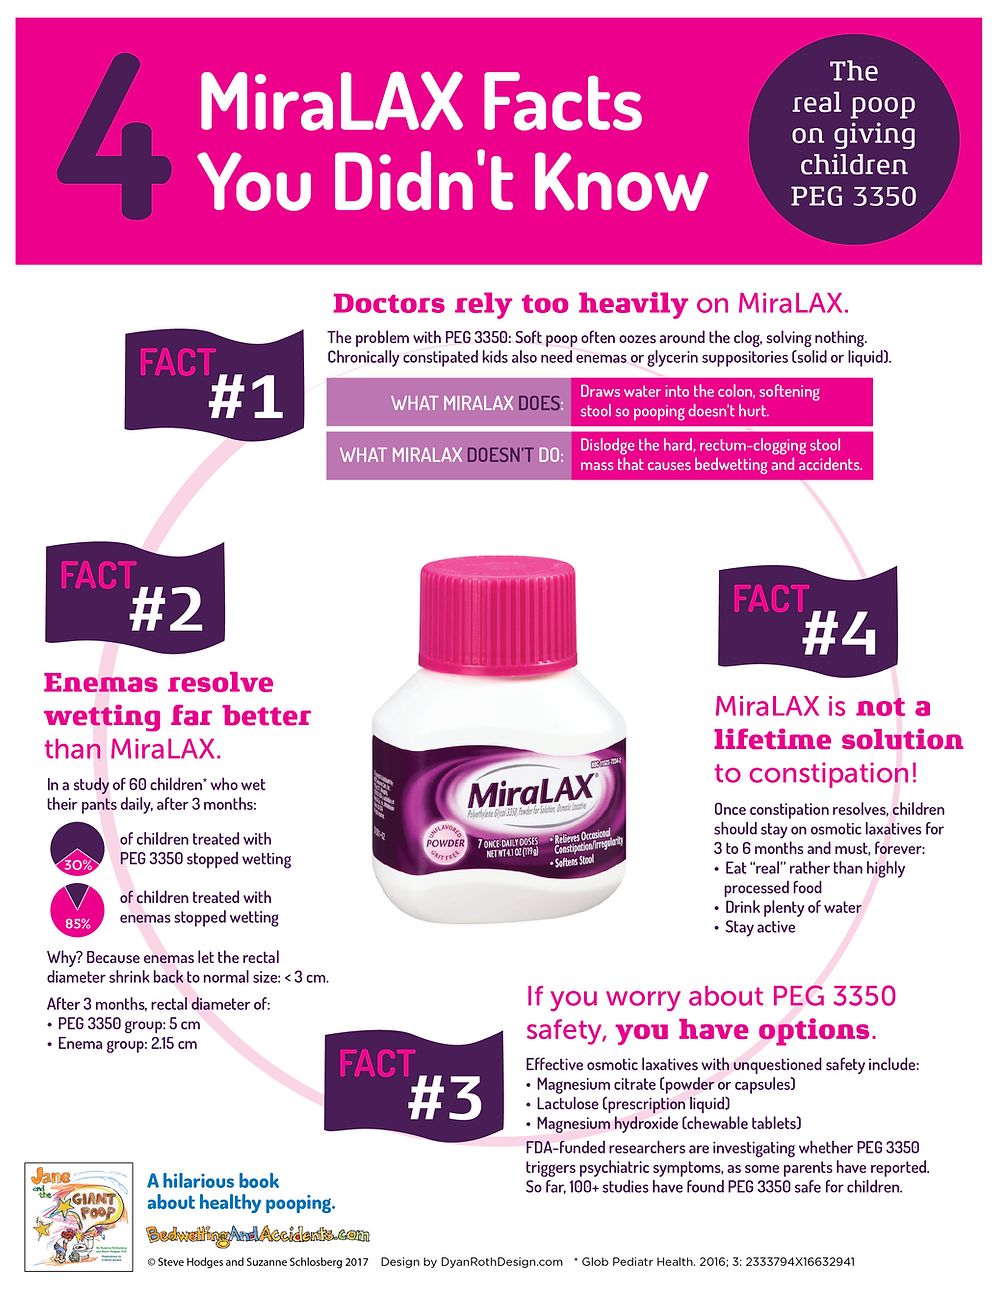 4 Miralax facts